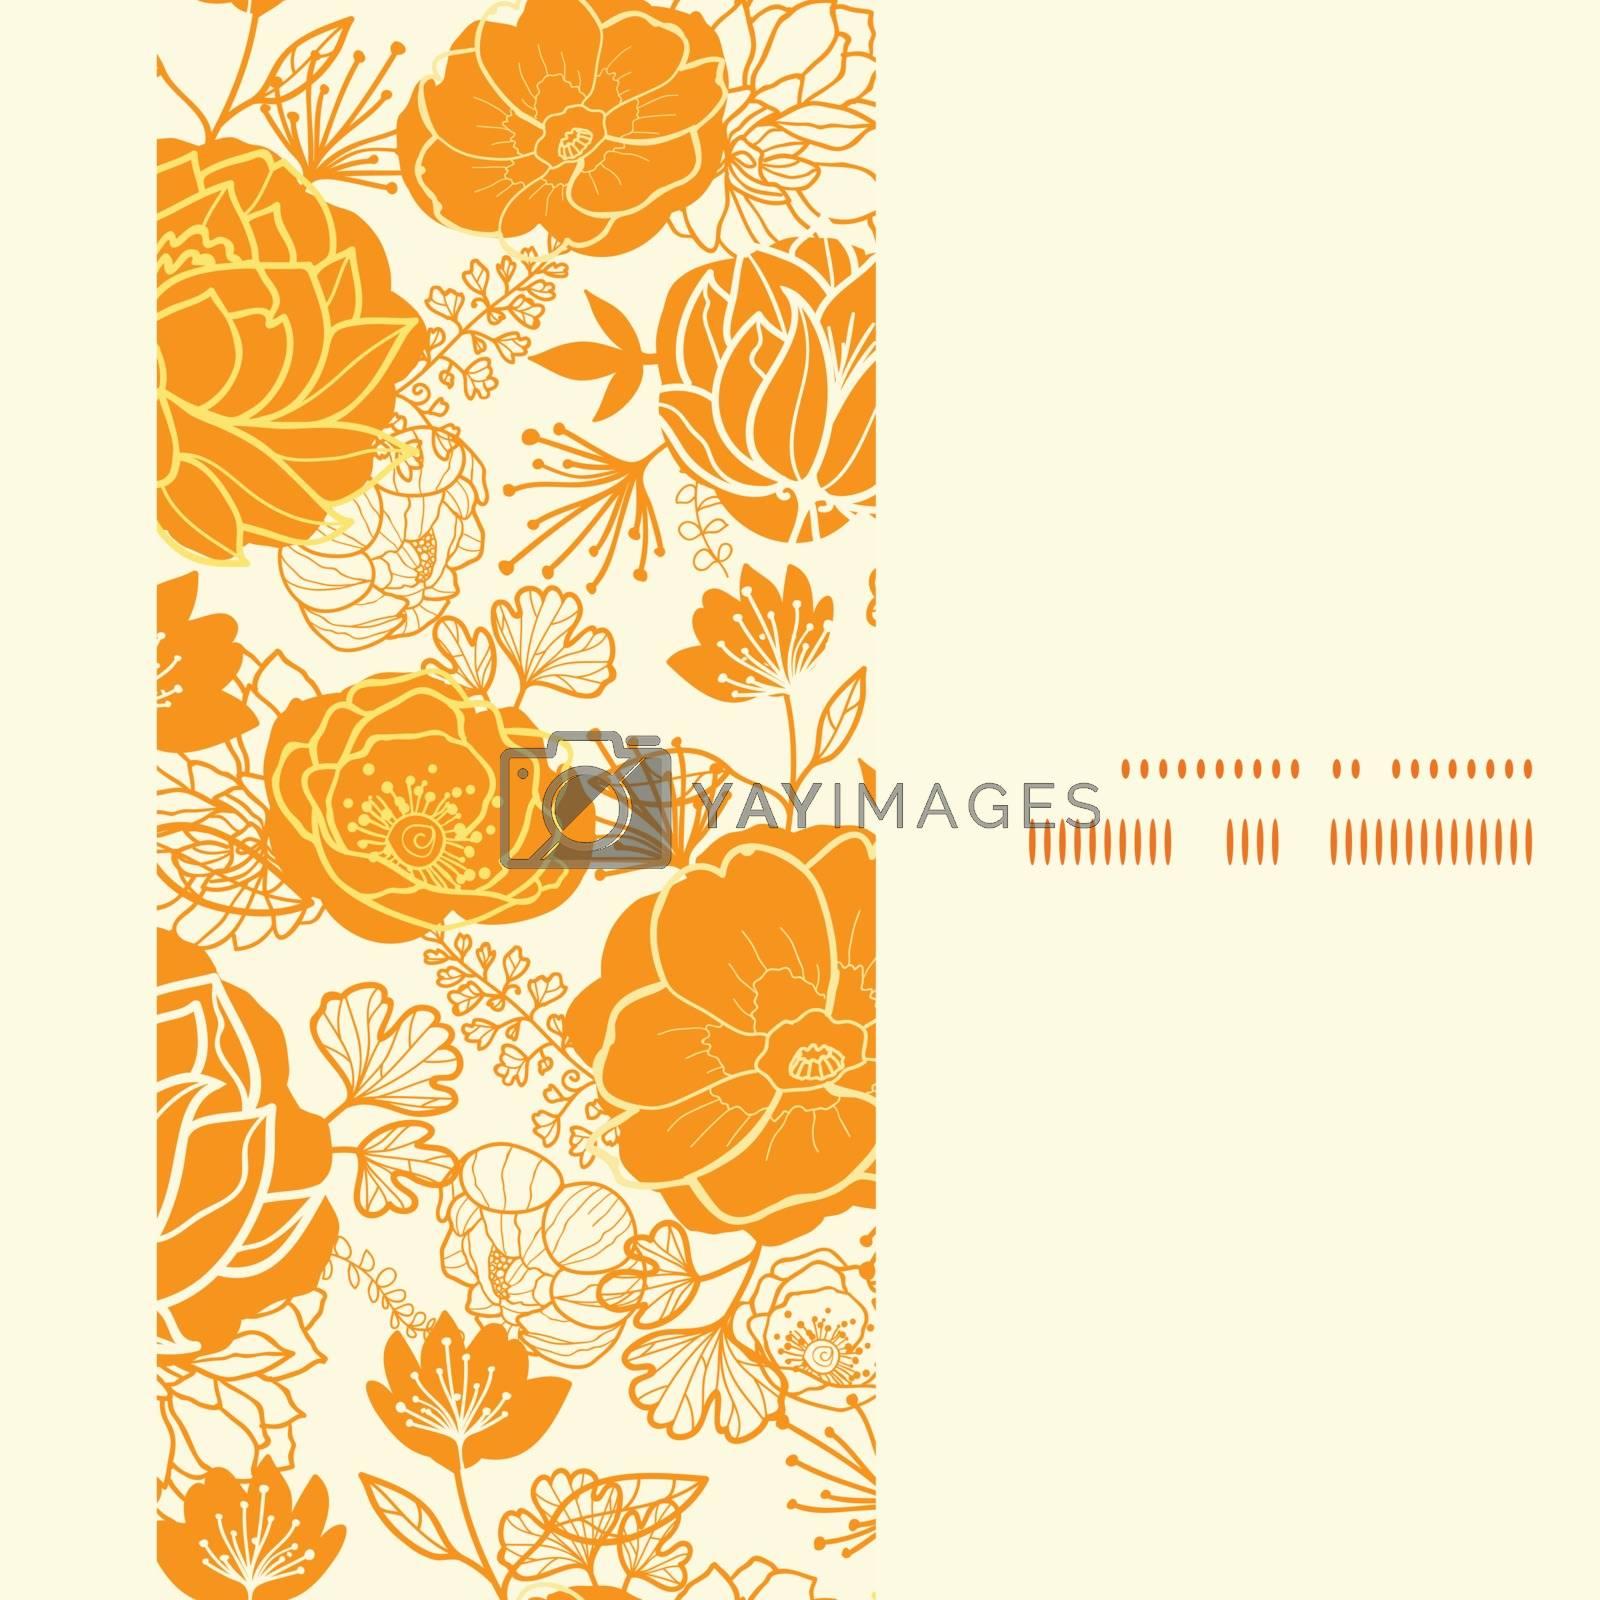 Vector golden art flowers vertical frame seamless pattern background graphic design